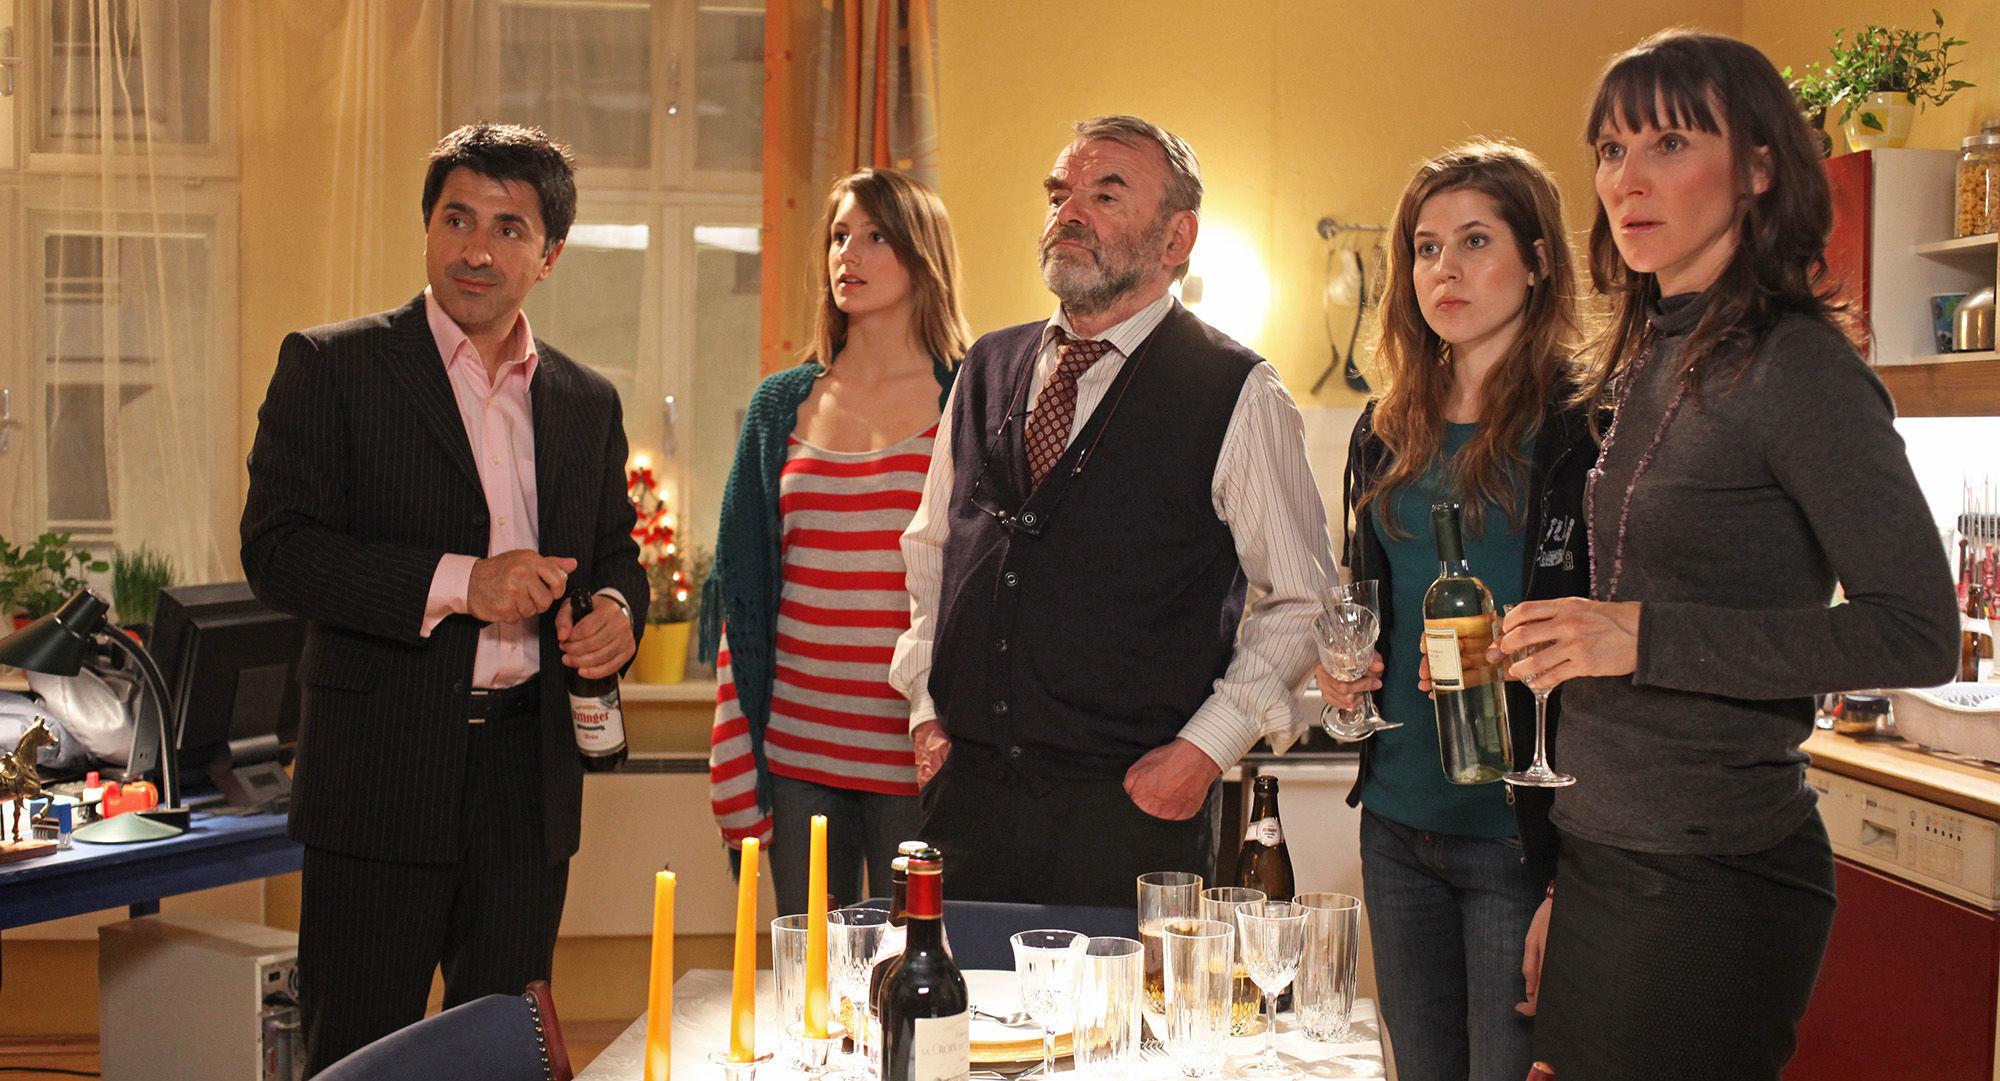 Haydar Zorlu (Seyfi Ülbül), Julia Krombach (Nadine Horrowitz), Branko Samarovski (Onkel Frido), Nora Heschl (Judith Schnabel), Maria Köstlinger (Anna Schnabel)